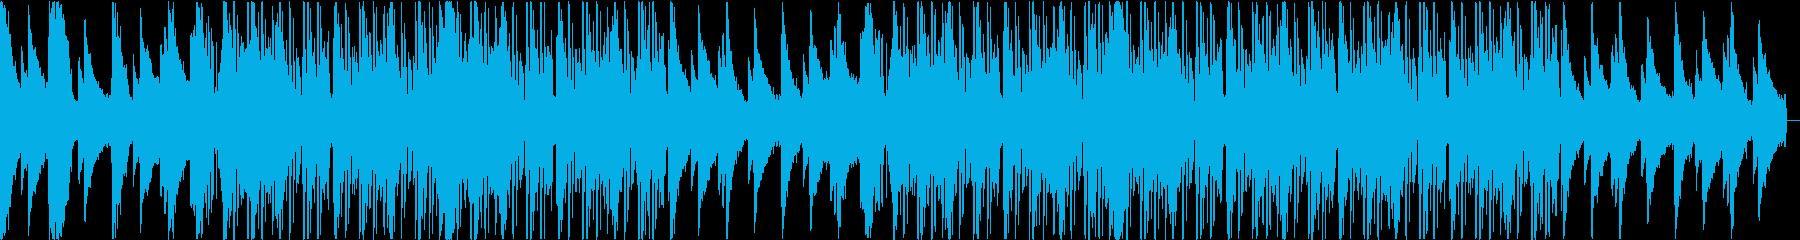 Lofi,ローファイヒップホップ2の再生済みの波形